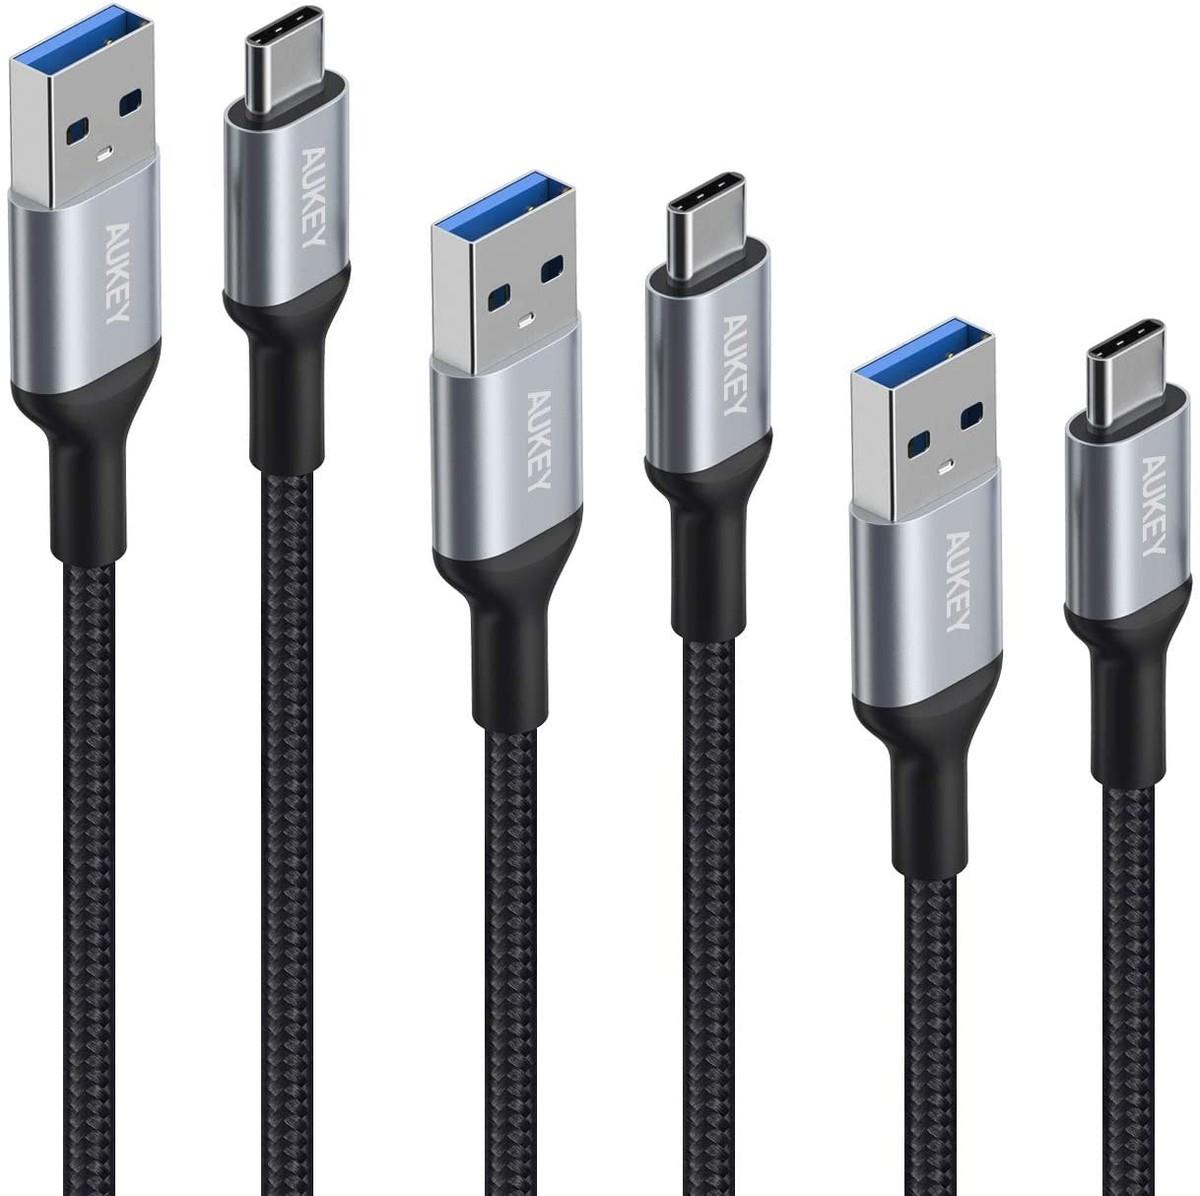 AUKEY USB Type-Cケーブル 3本セット